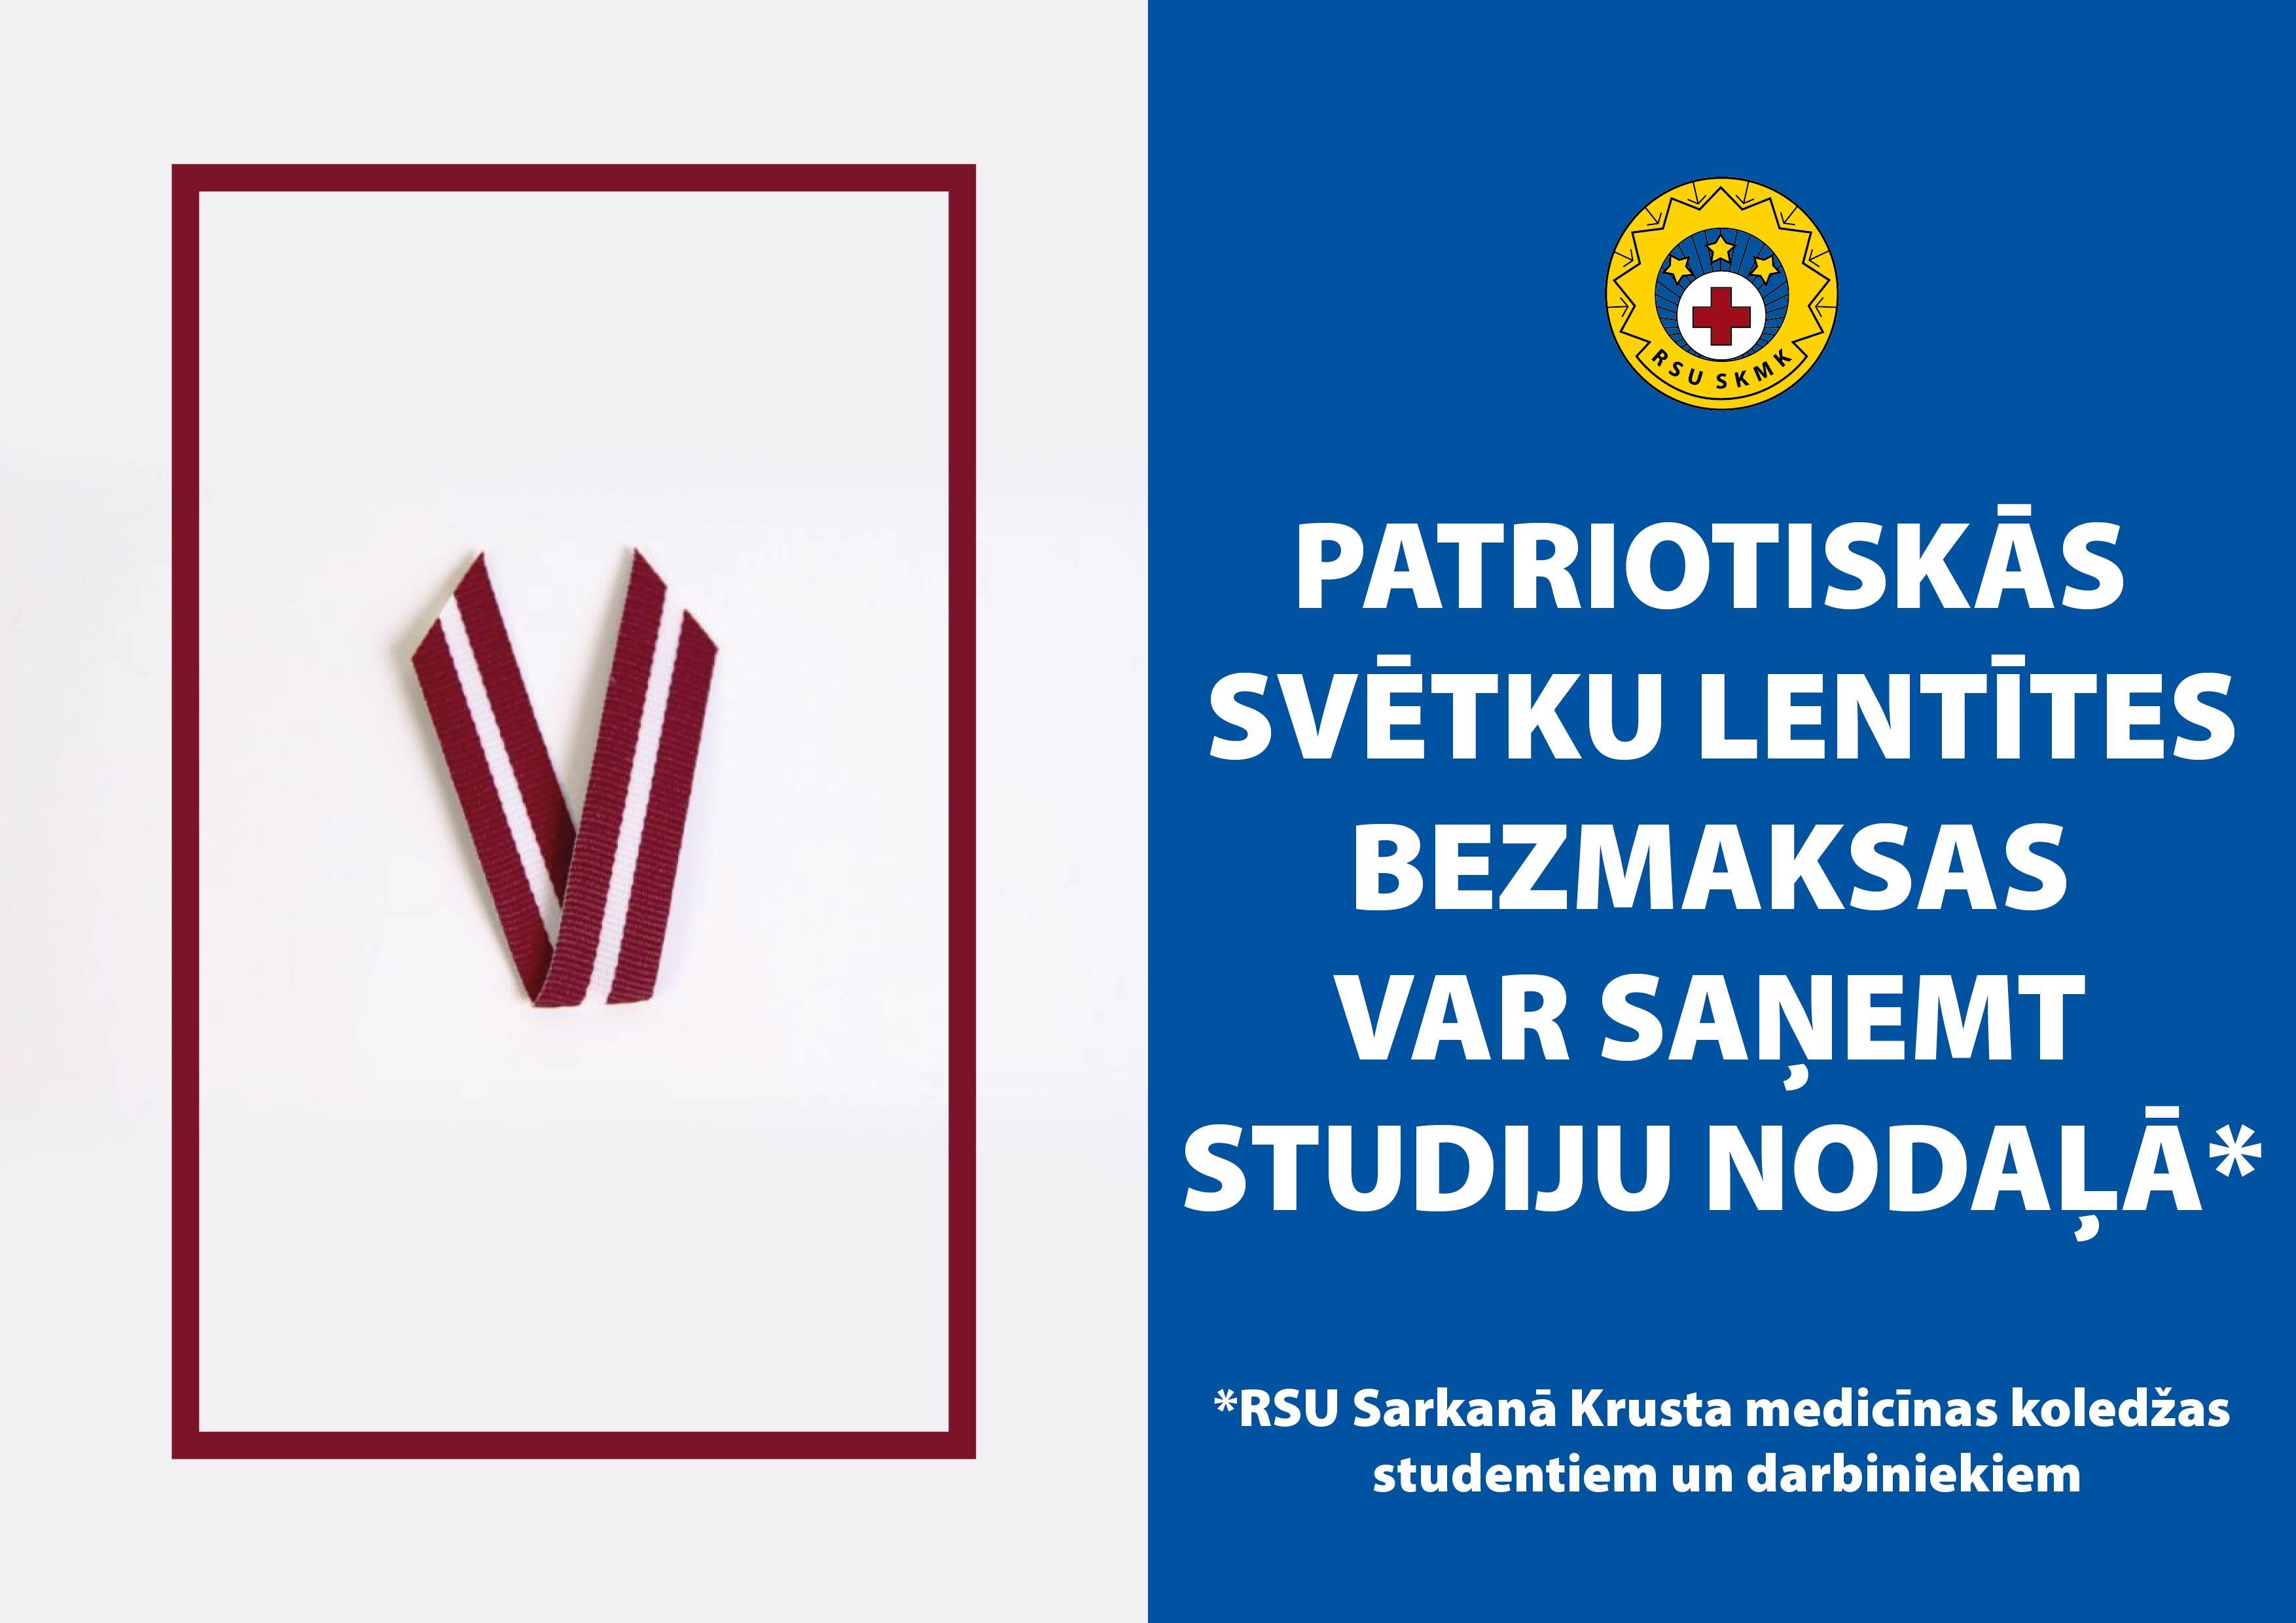 RSU_SKMK_11_novembris_LENTITES-01